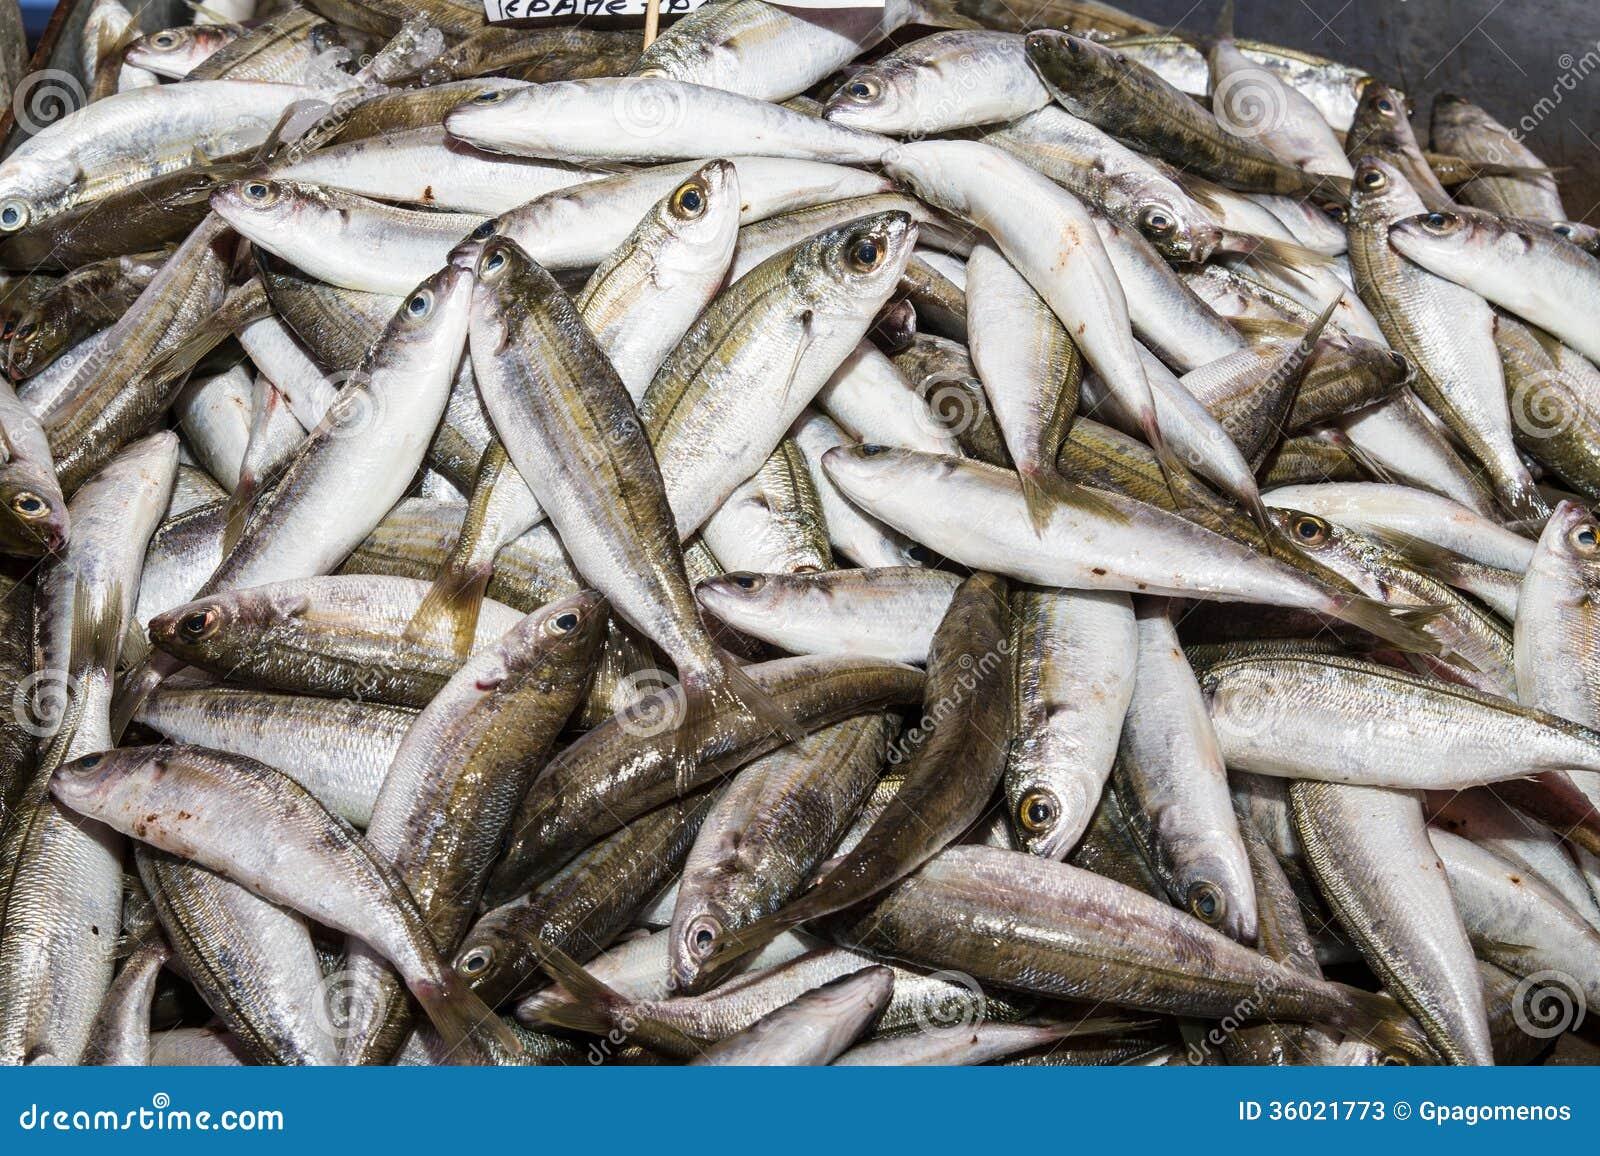 Fresh fish catch stock image. Image of cuisine, ingredient ...